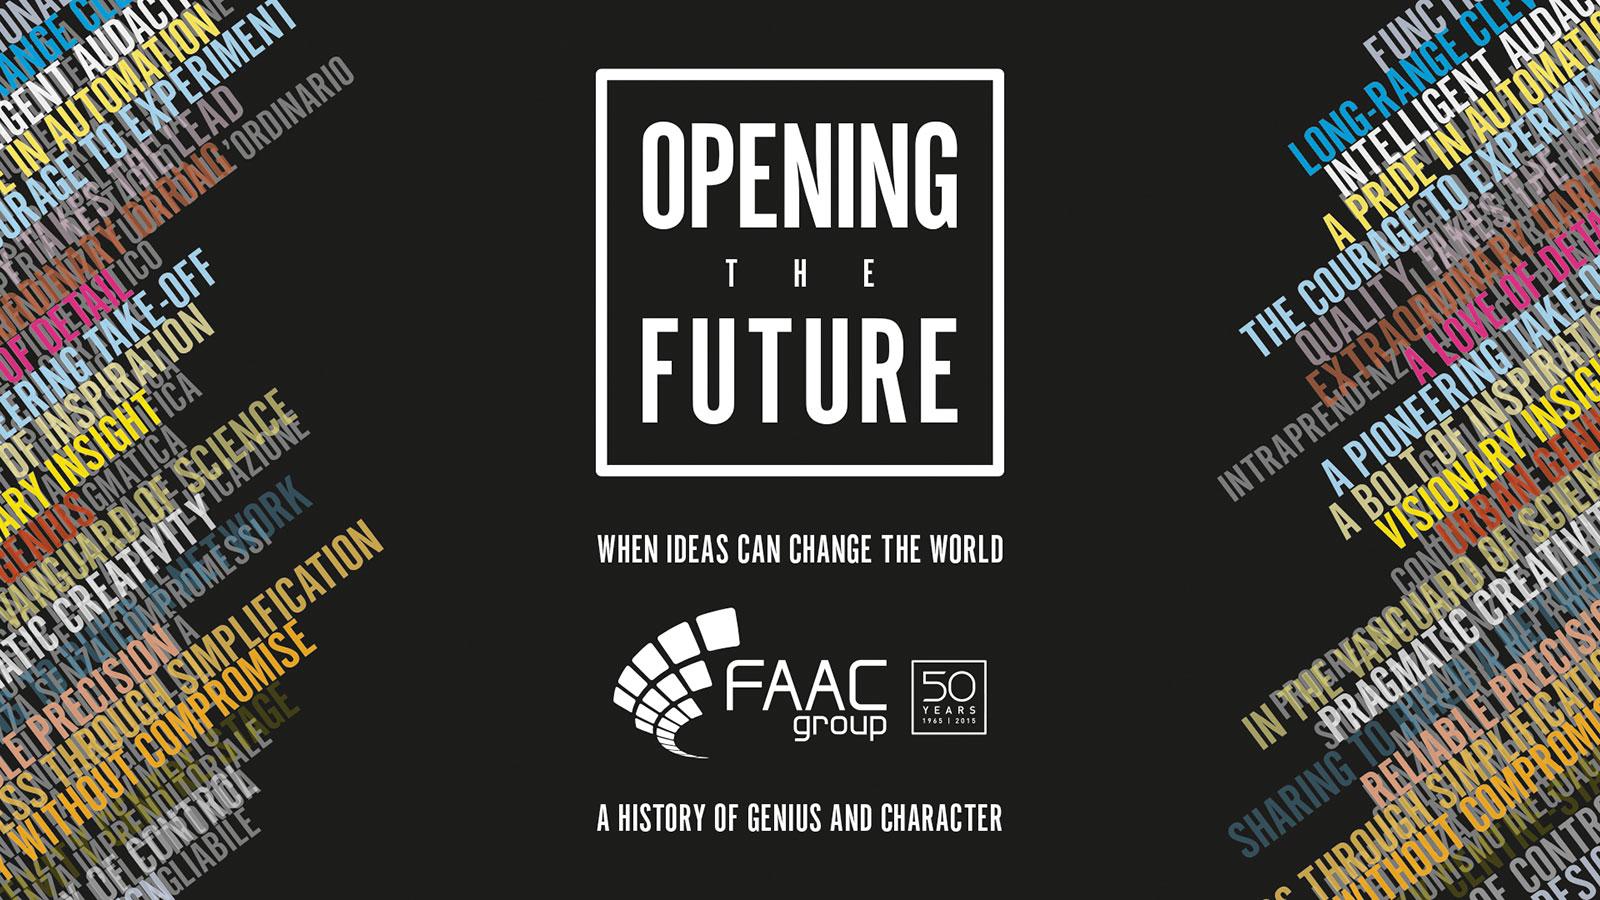 'Opening the Future': i 50 anni di FAAC secondo Menabò Group